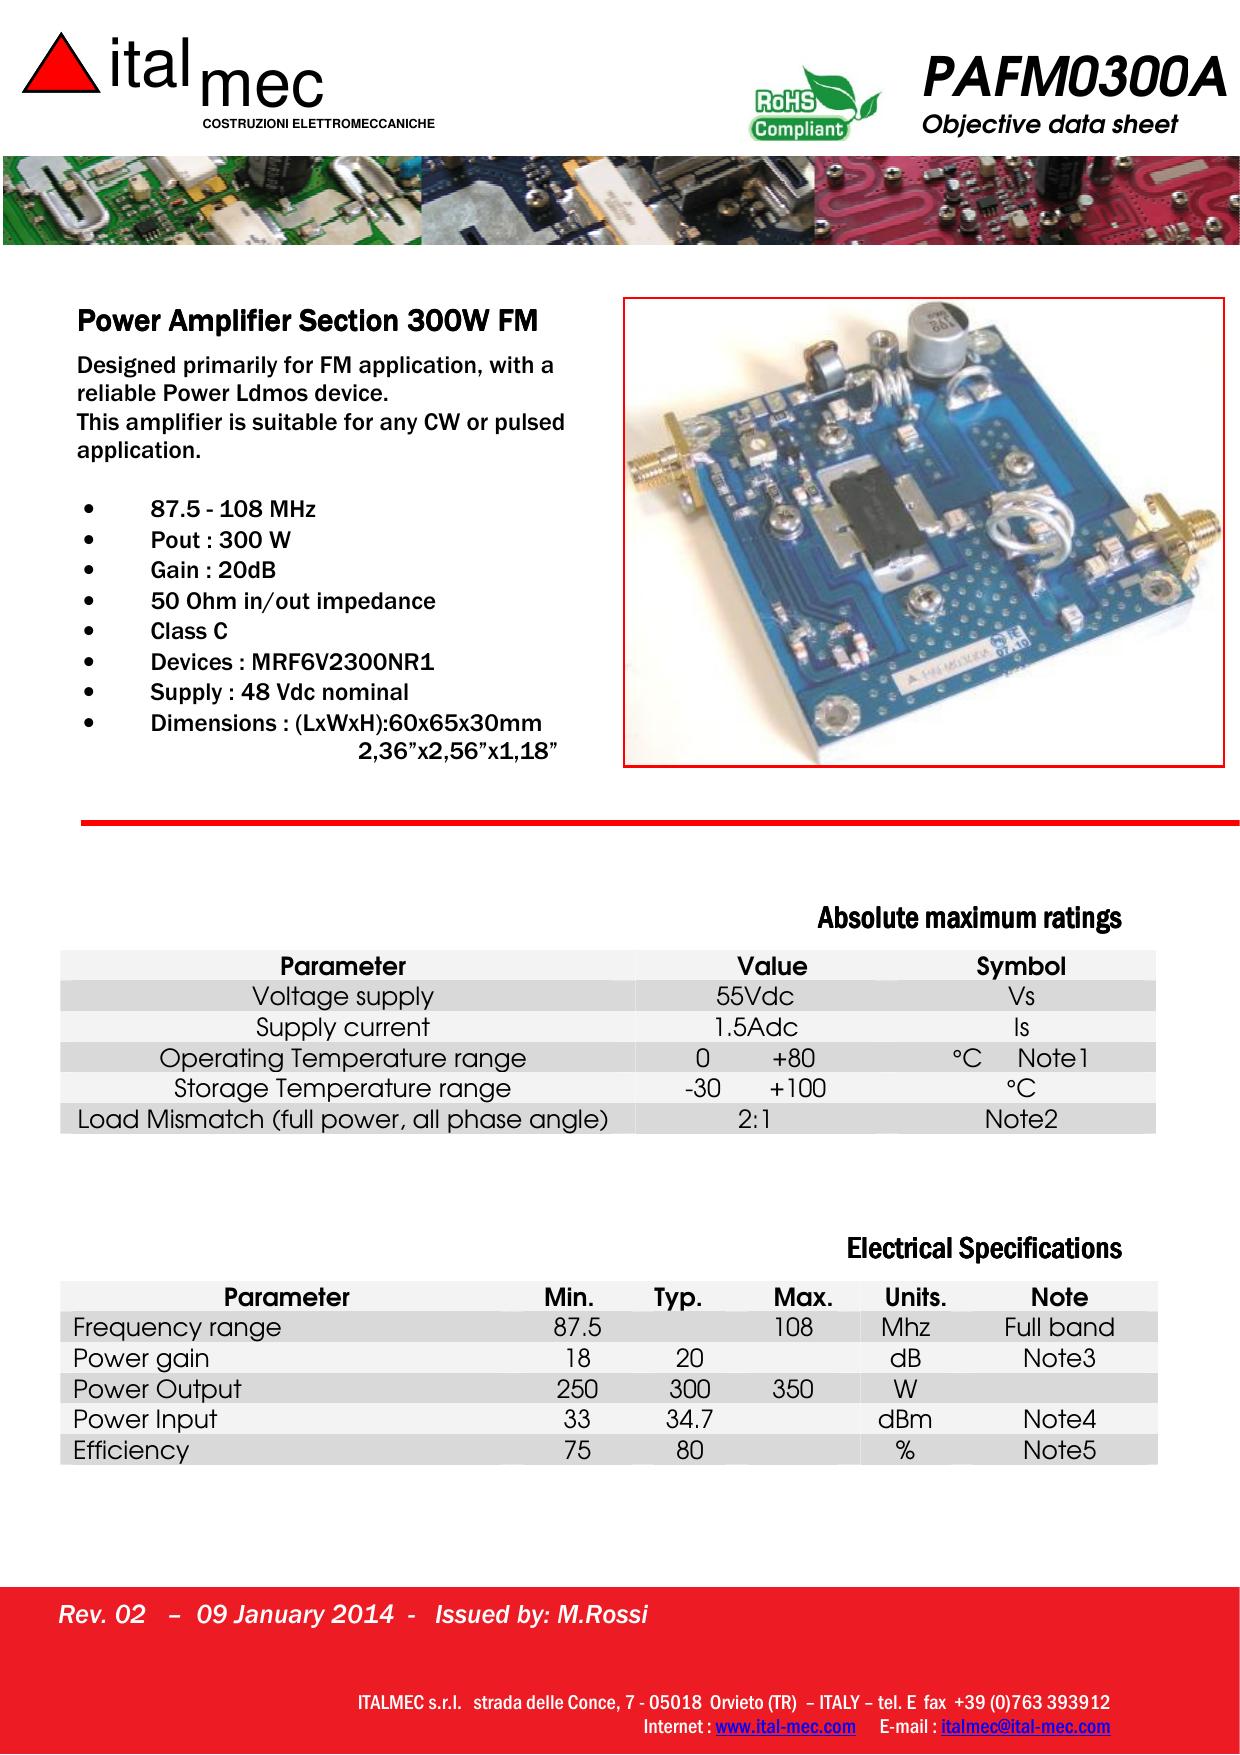 Eletric Circuit39s Components Symbols Eletric Circuit39s Components